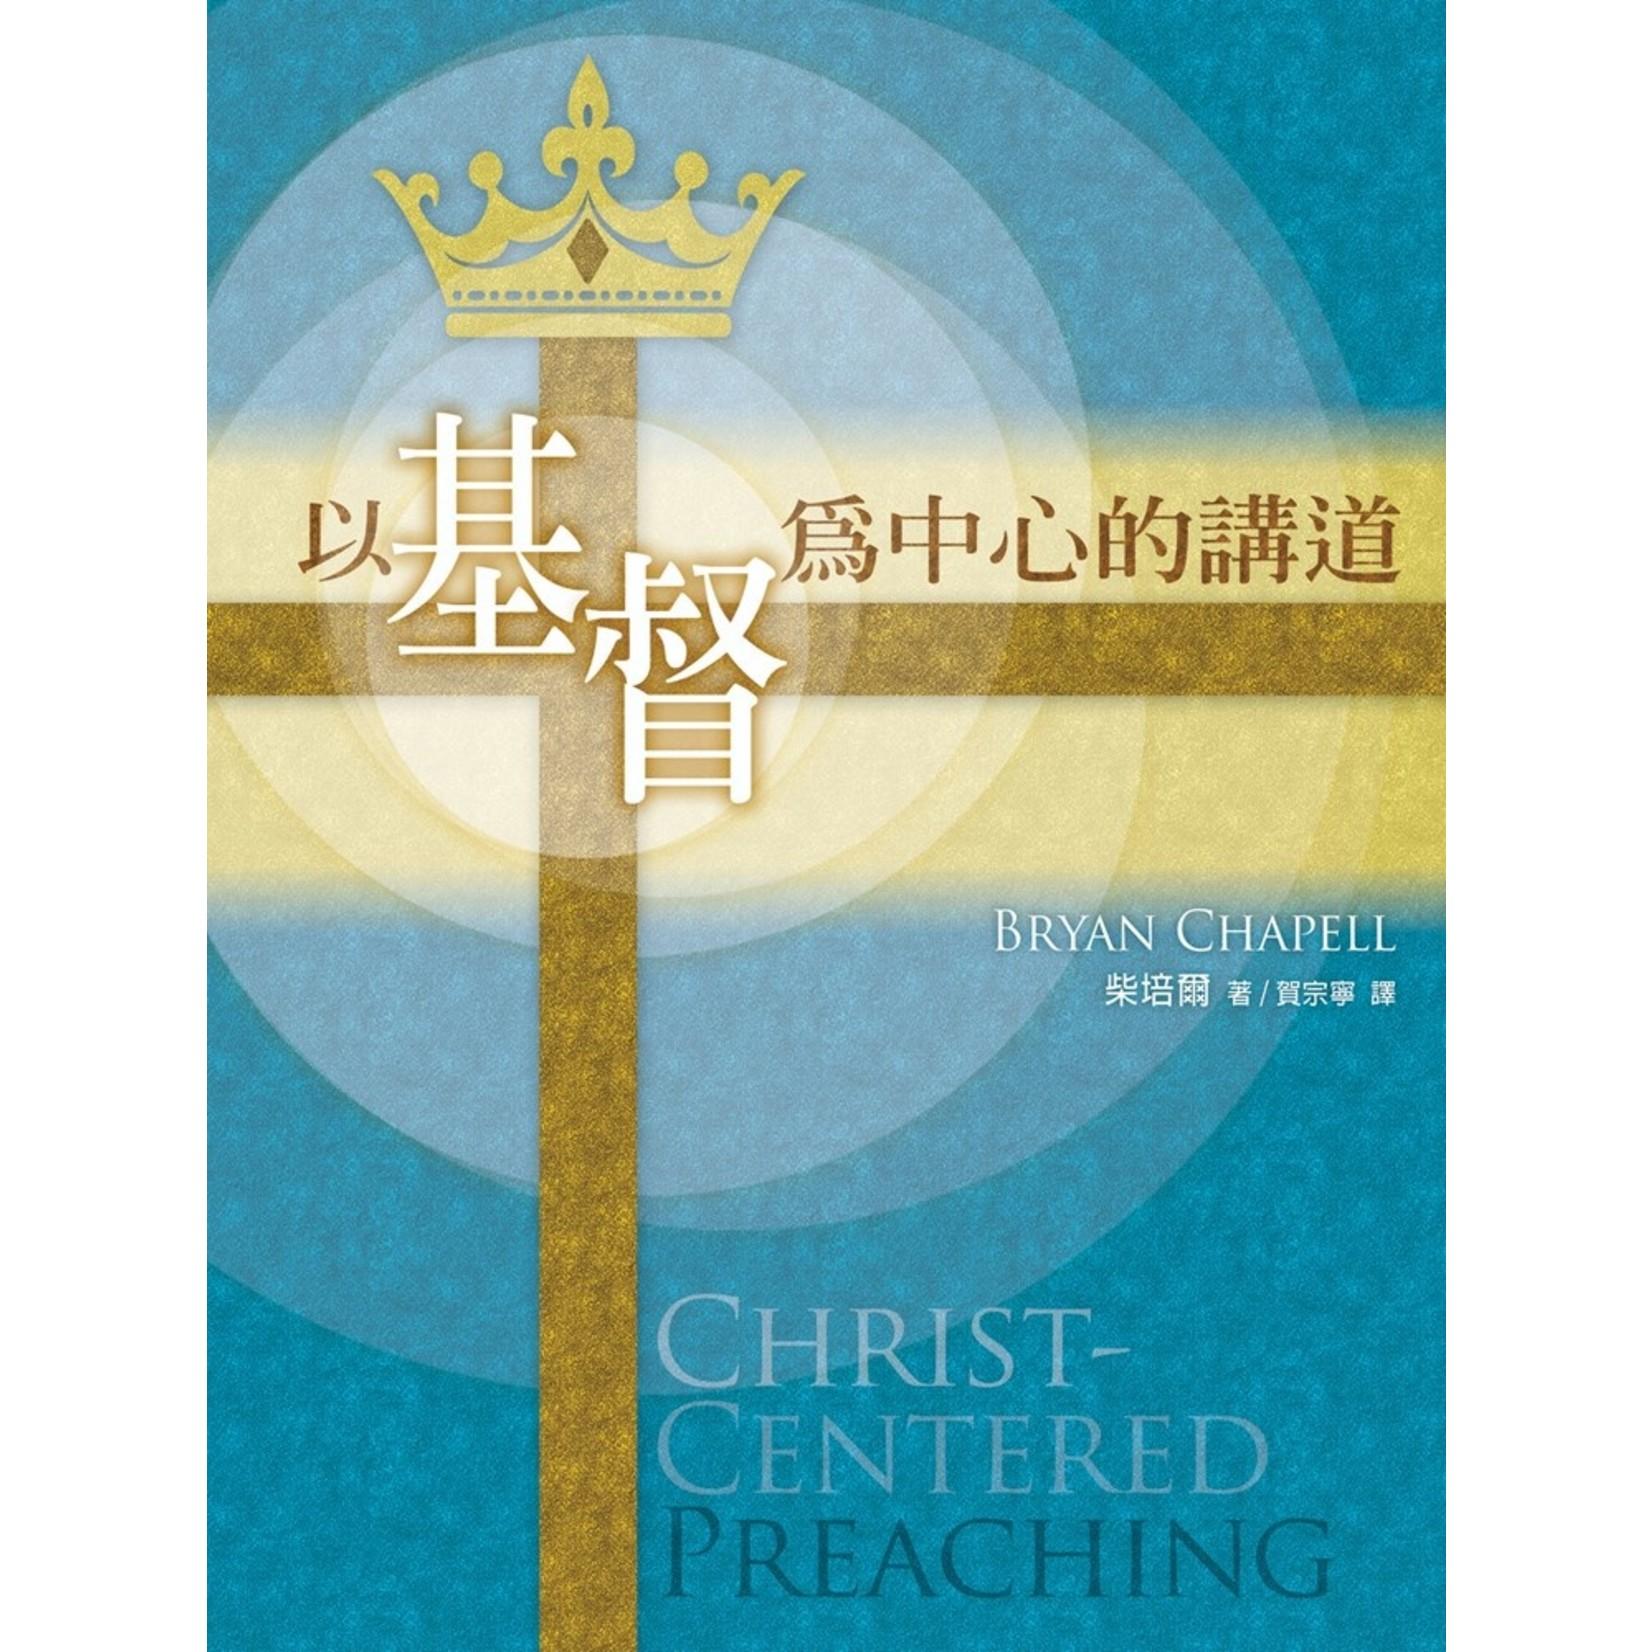 更新傳道會 Christian Renewal Ministries 以基督為中心的講道 Christ-Centered Preaching